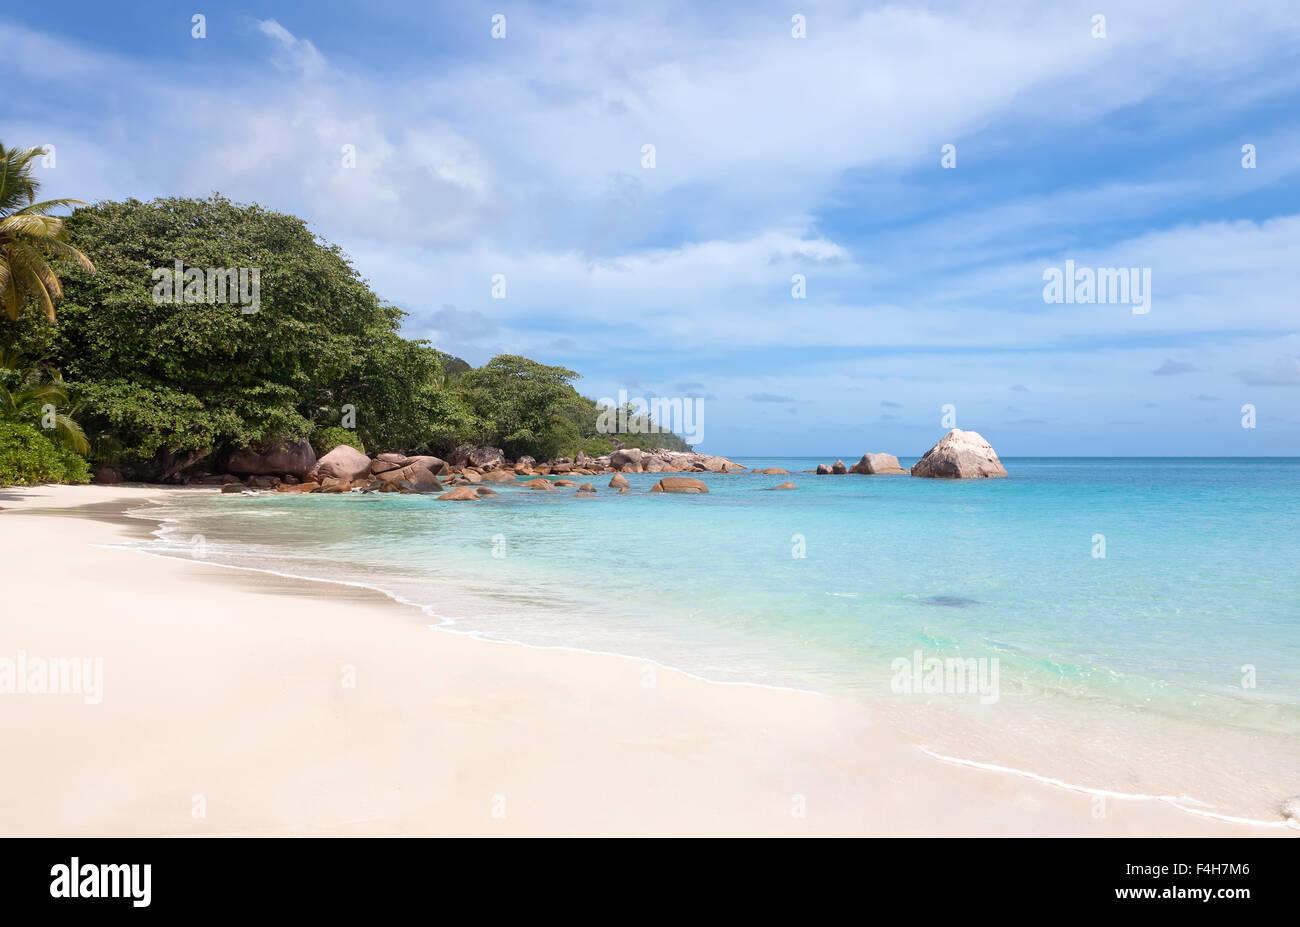 Beach Anse Lazio on the island of Praslin, Seychelles - Stock Image